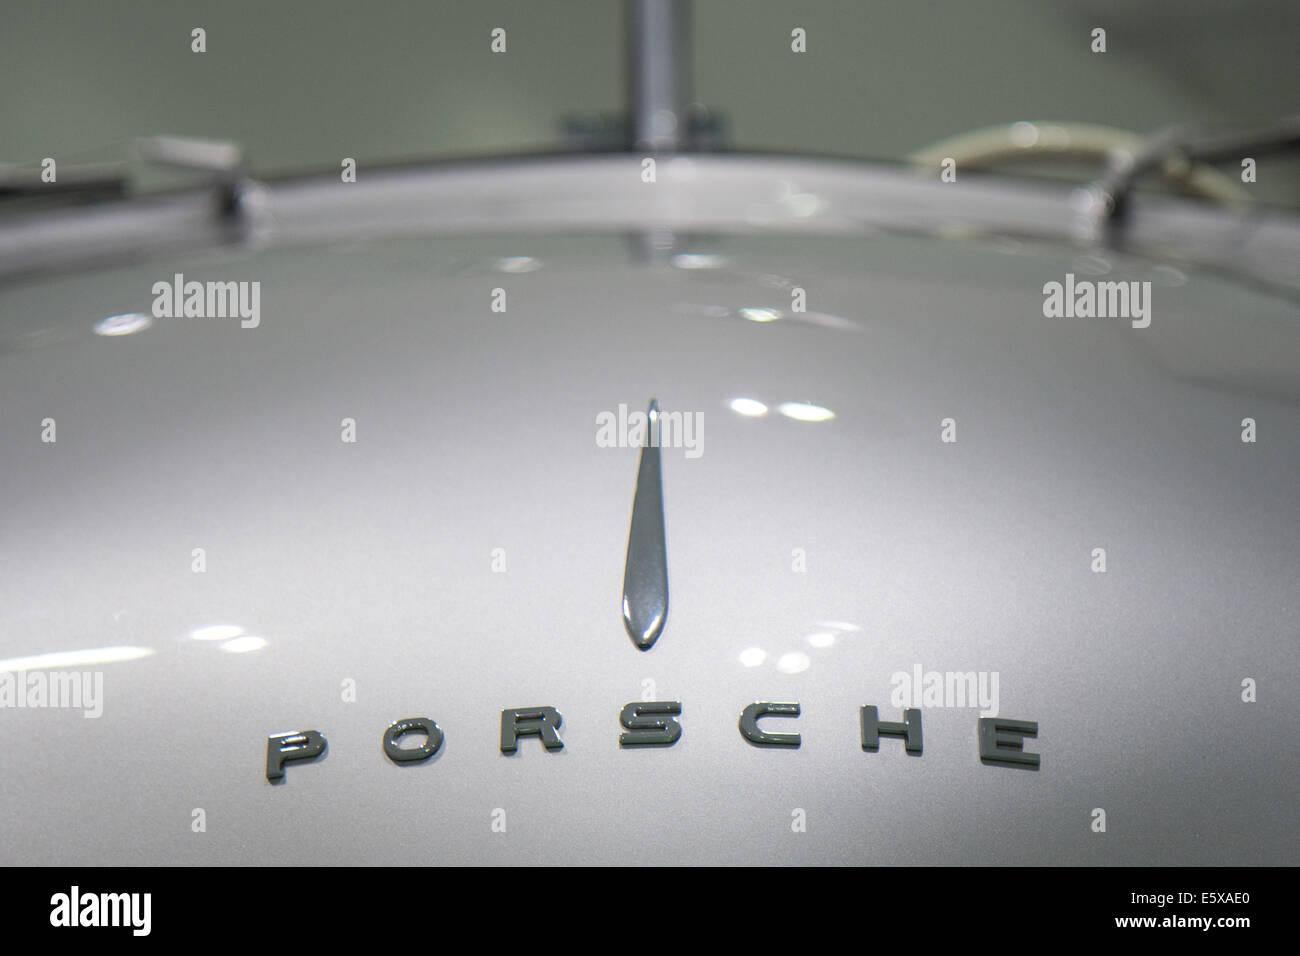 Germany porsche 356 no1 roadster 1948 at porsche museum in germany porsche 356 no1 roadster 1948 at porsche museum in stuttgart photo from 17 july 2014 vanachro Choice Image